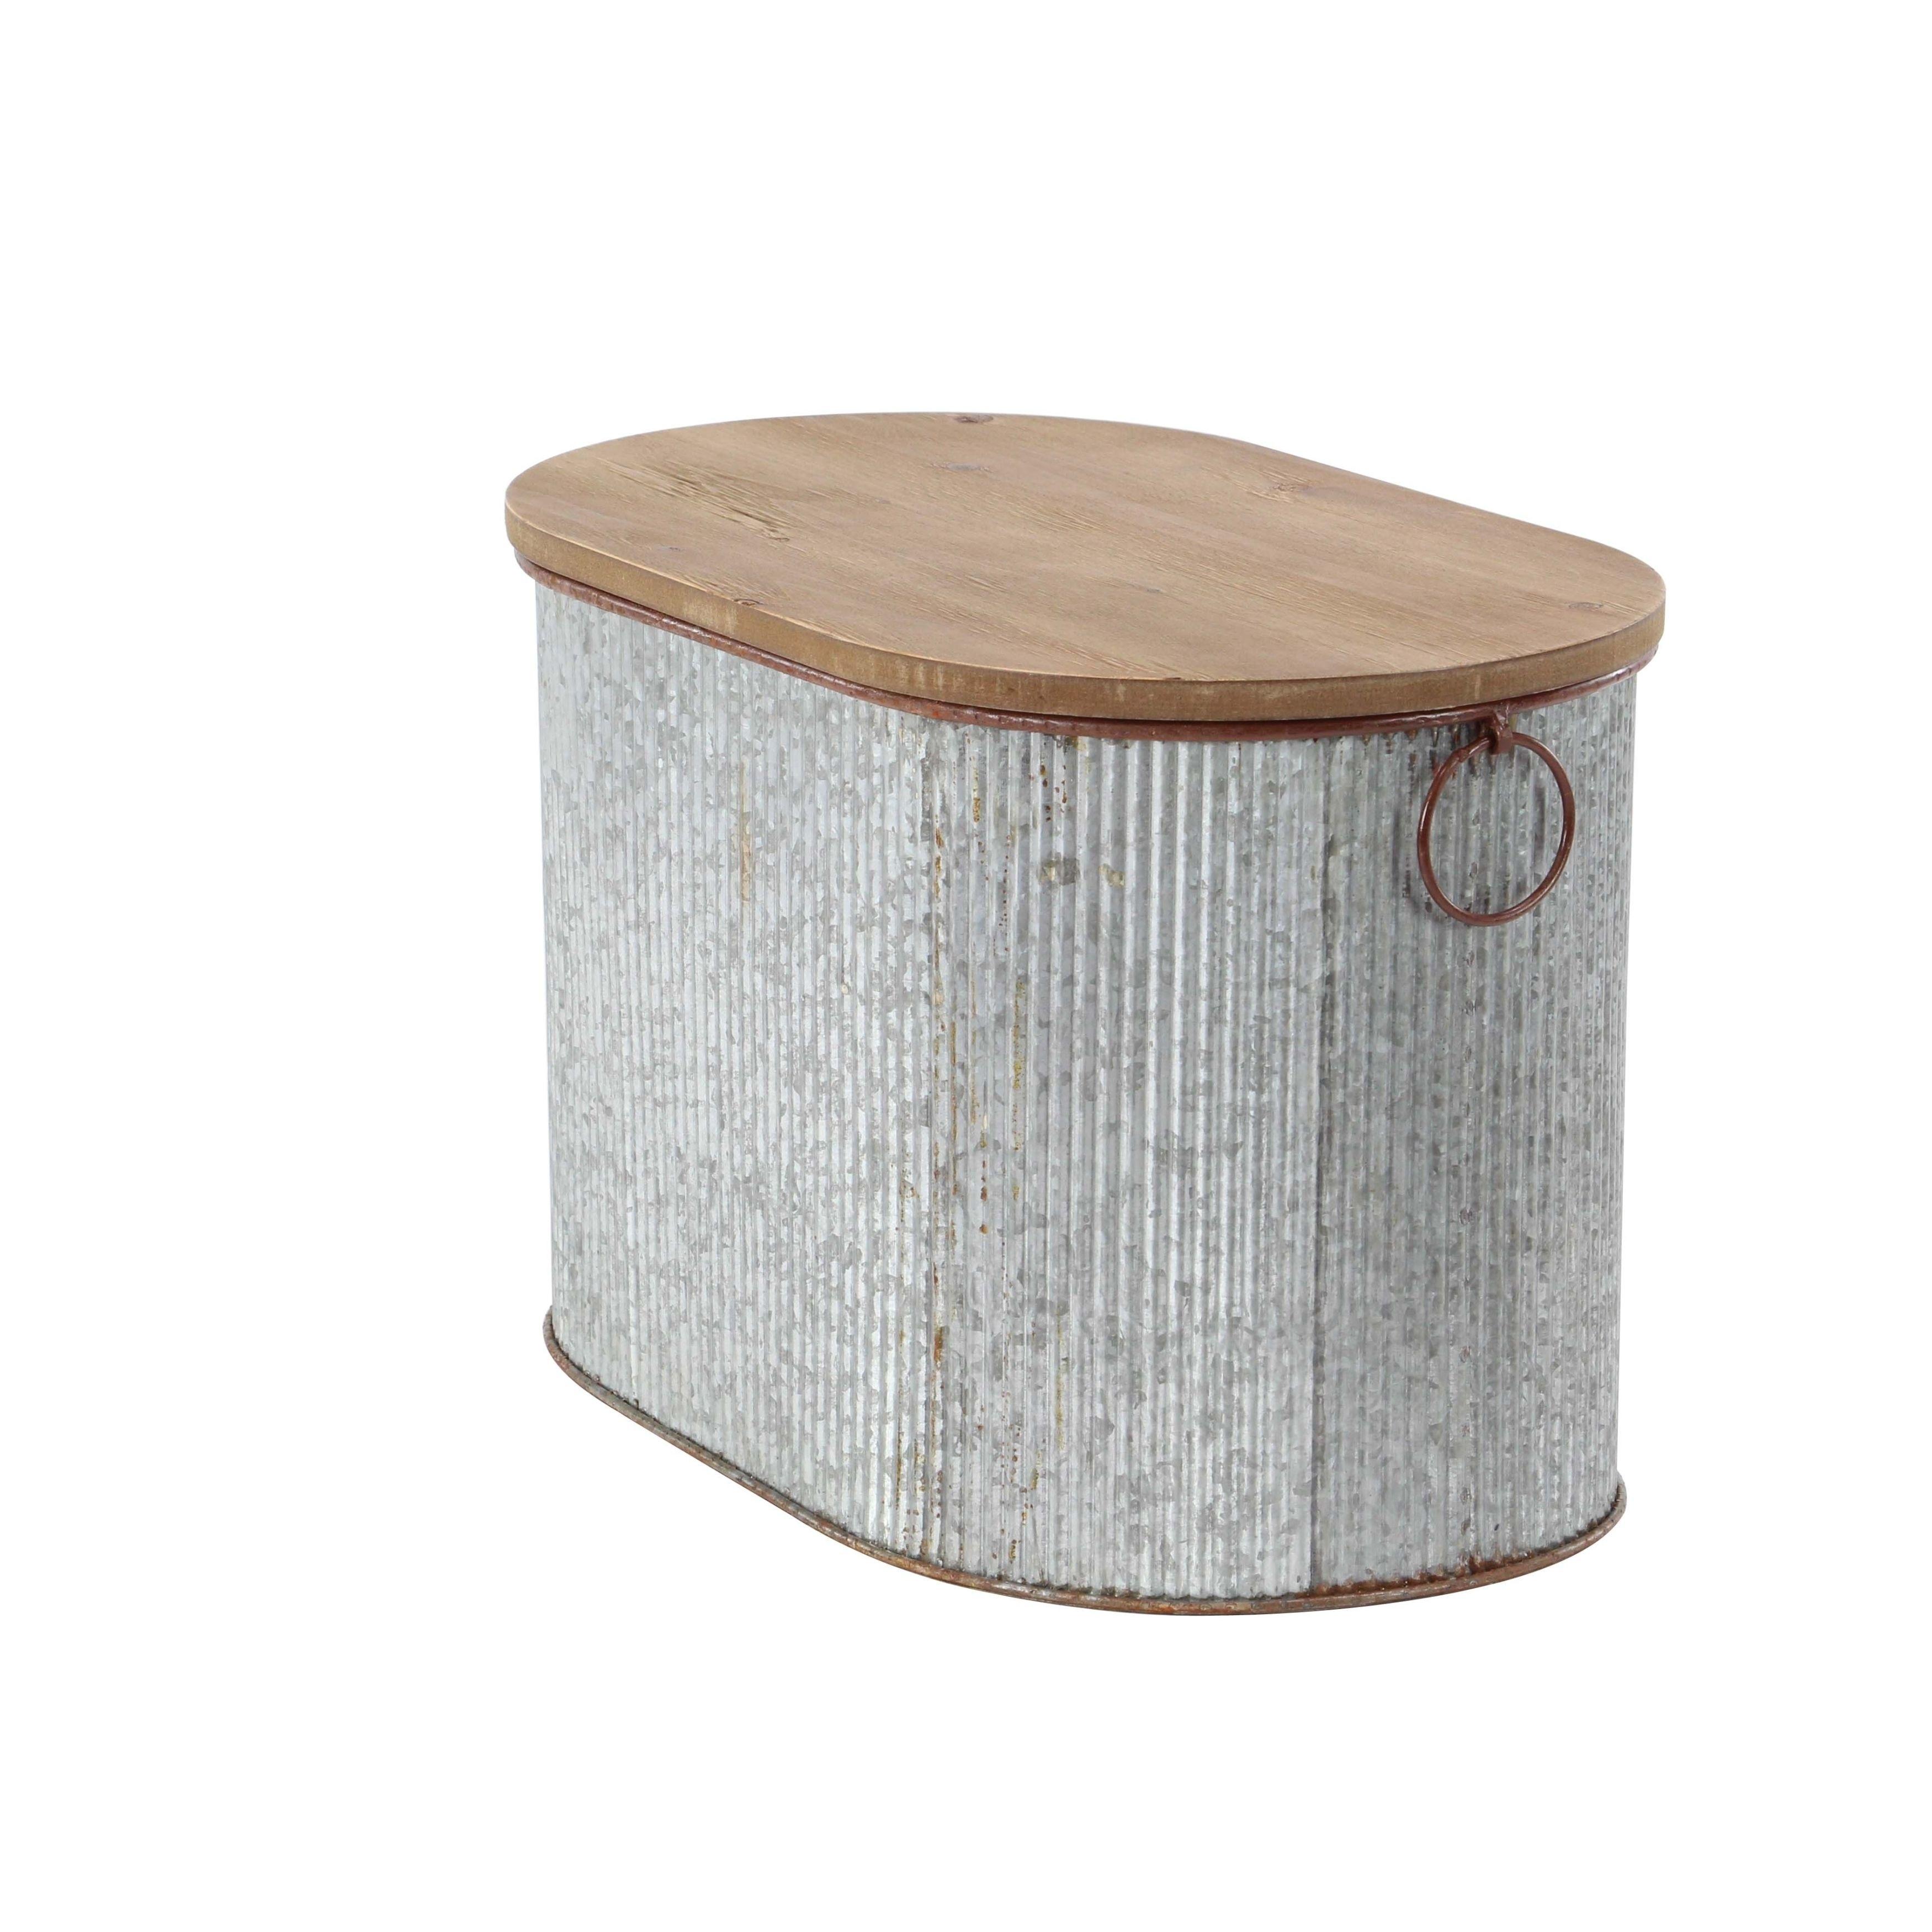 Set Of 3 Iron And Wood Corrugated Oval Storage Boxes